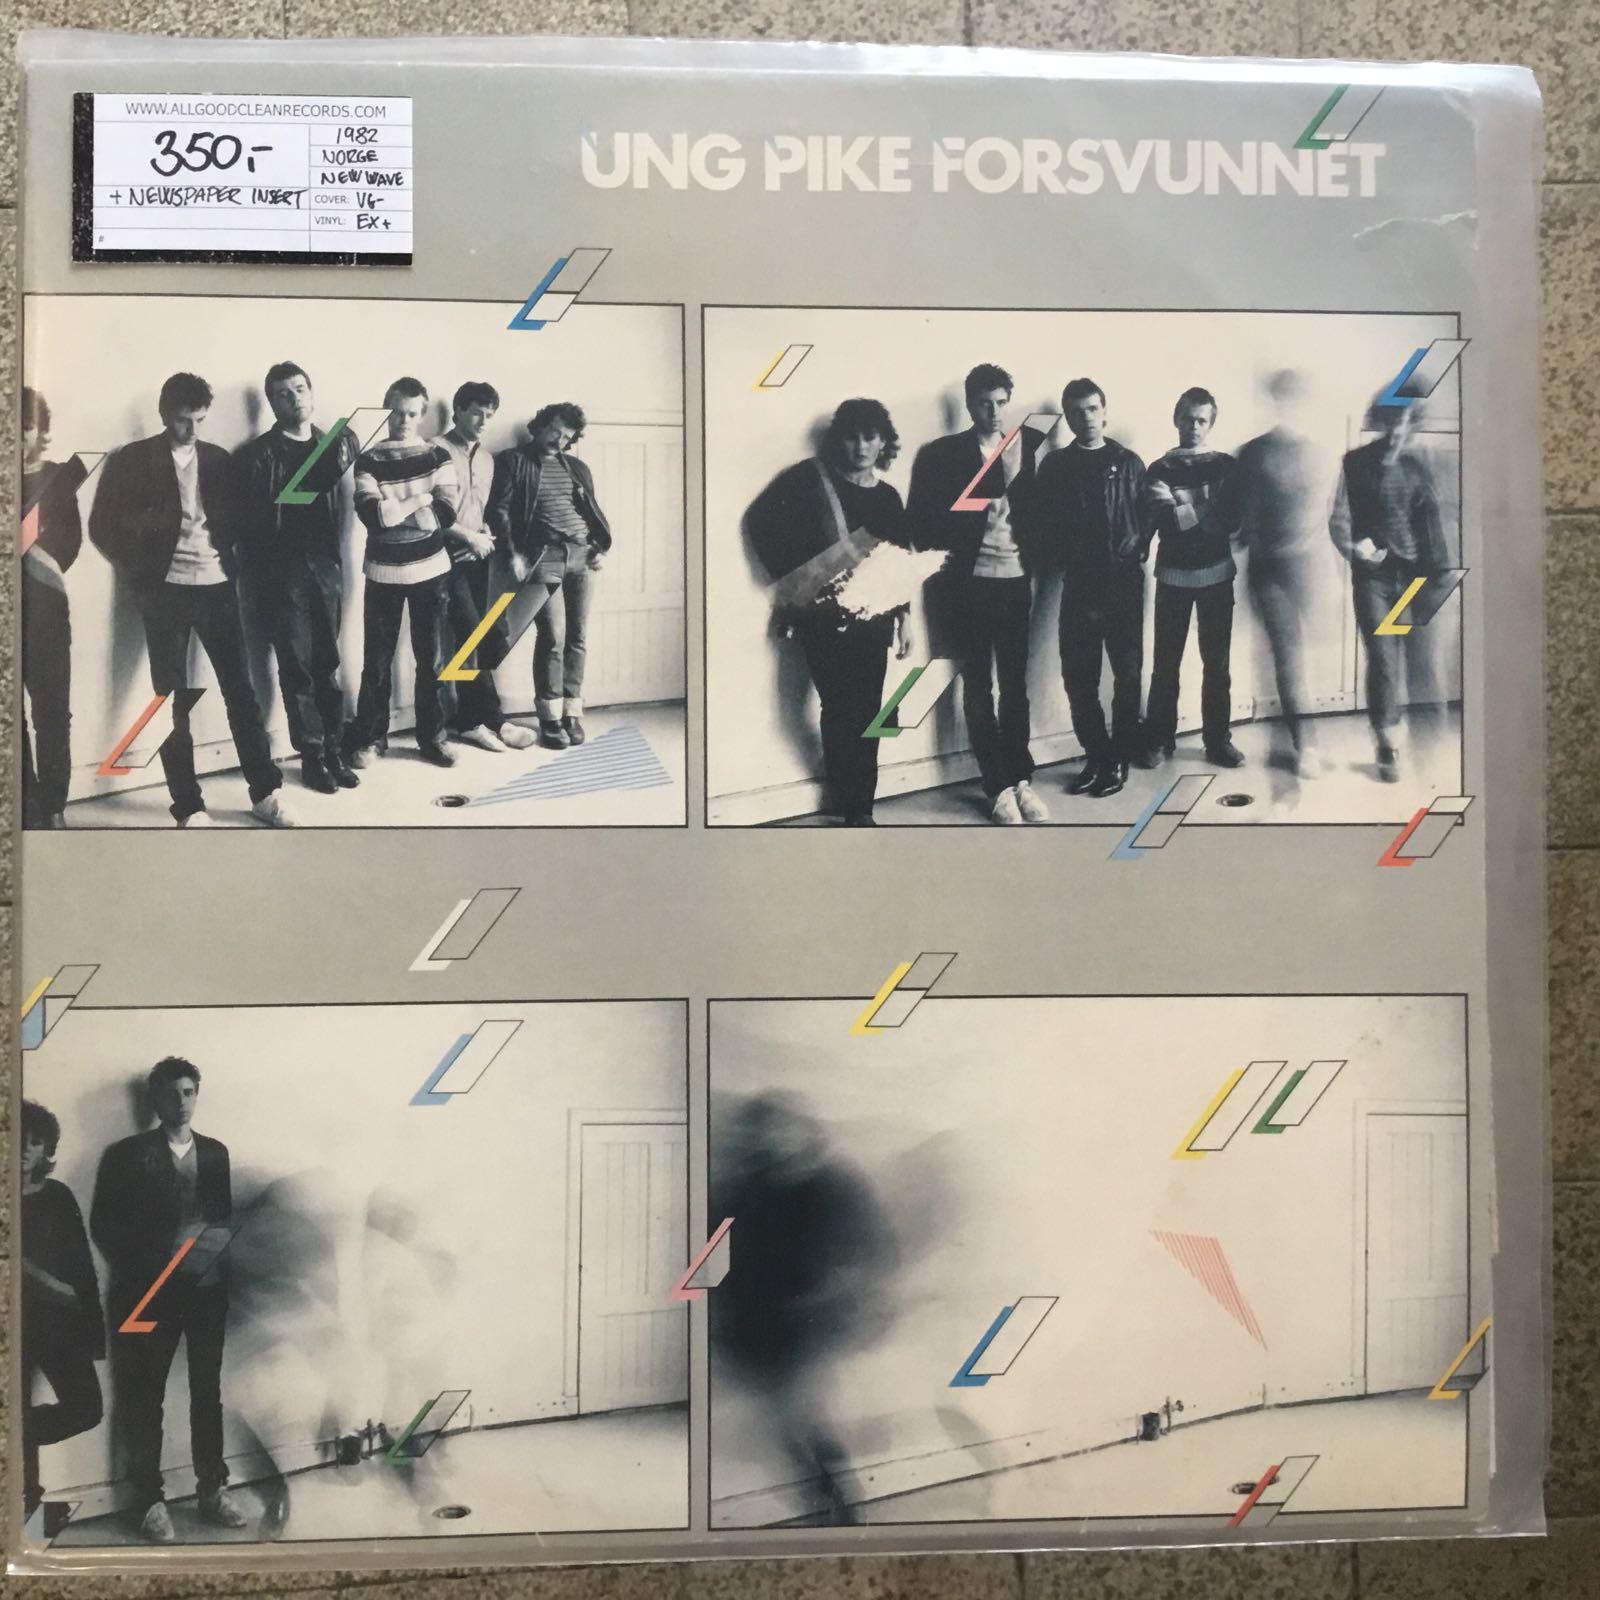 Ung Pike Forsvunnet – Ung Pike Forsvunnet [LP] (2. hand)